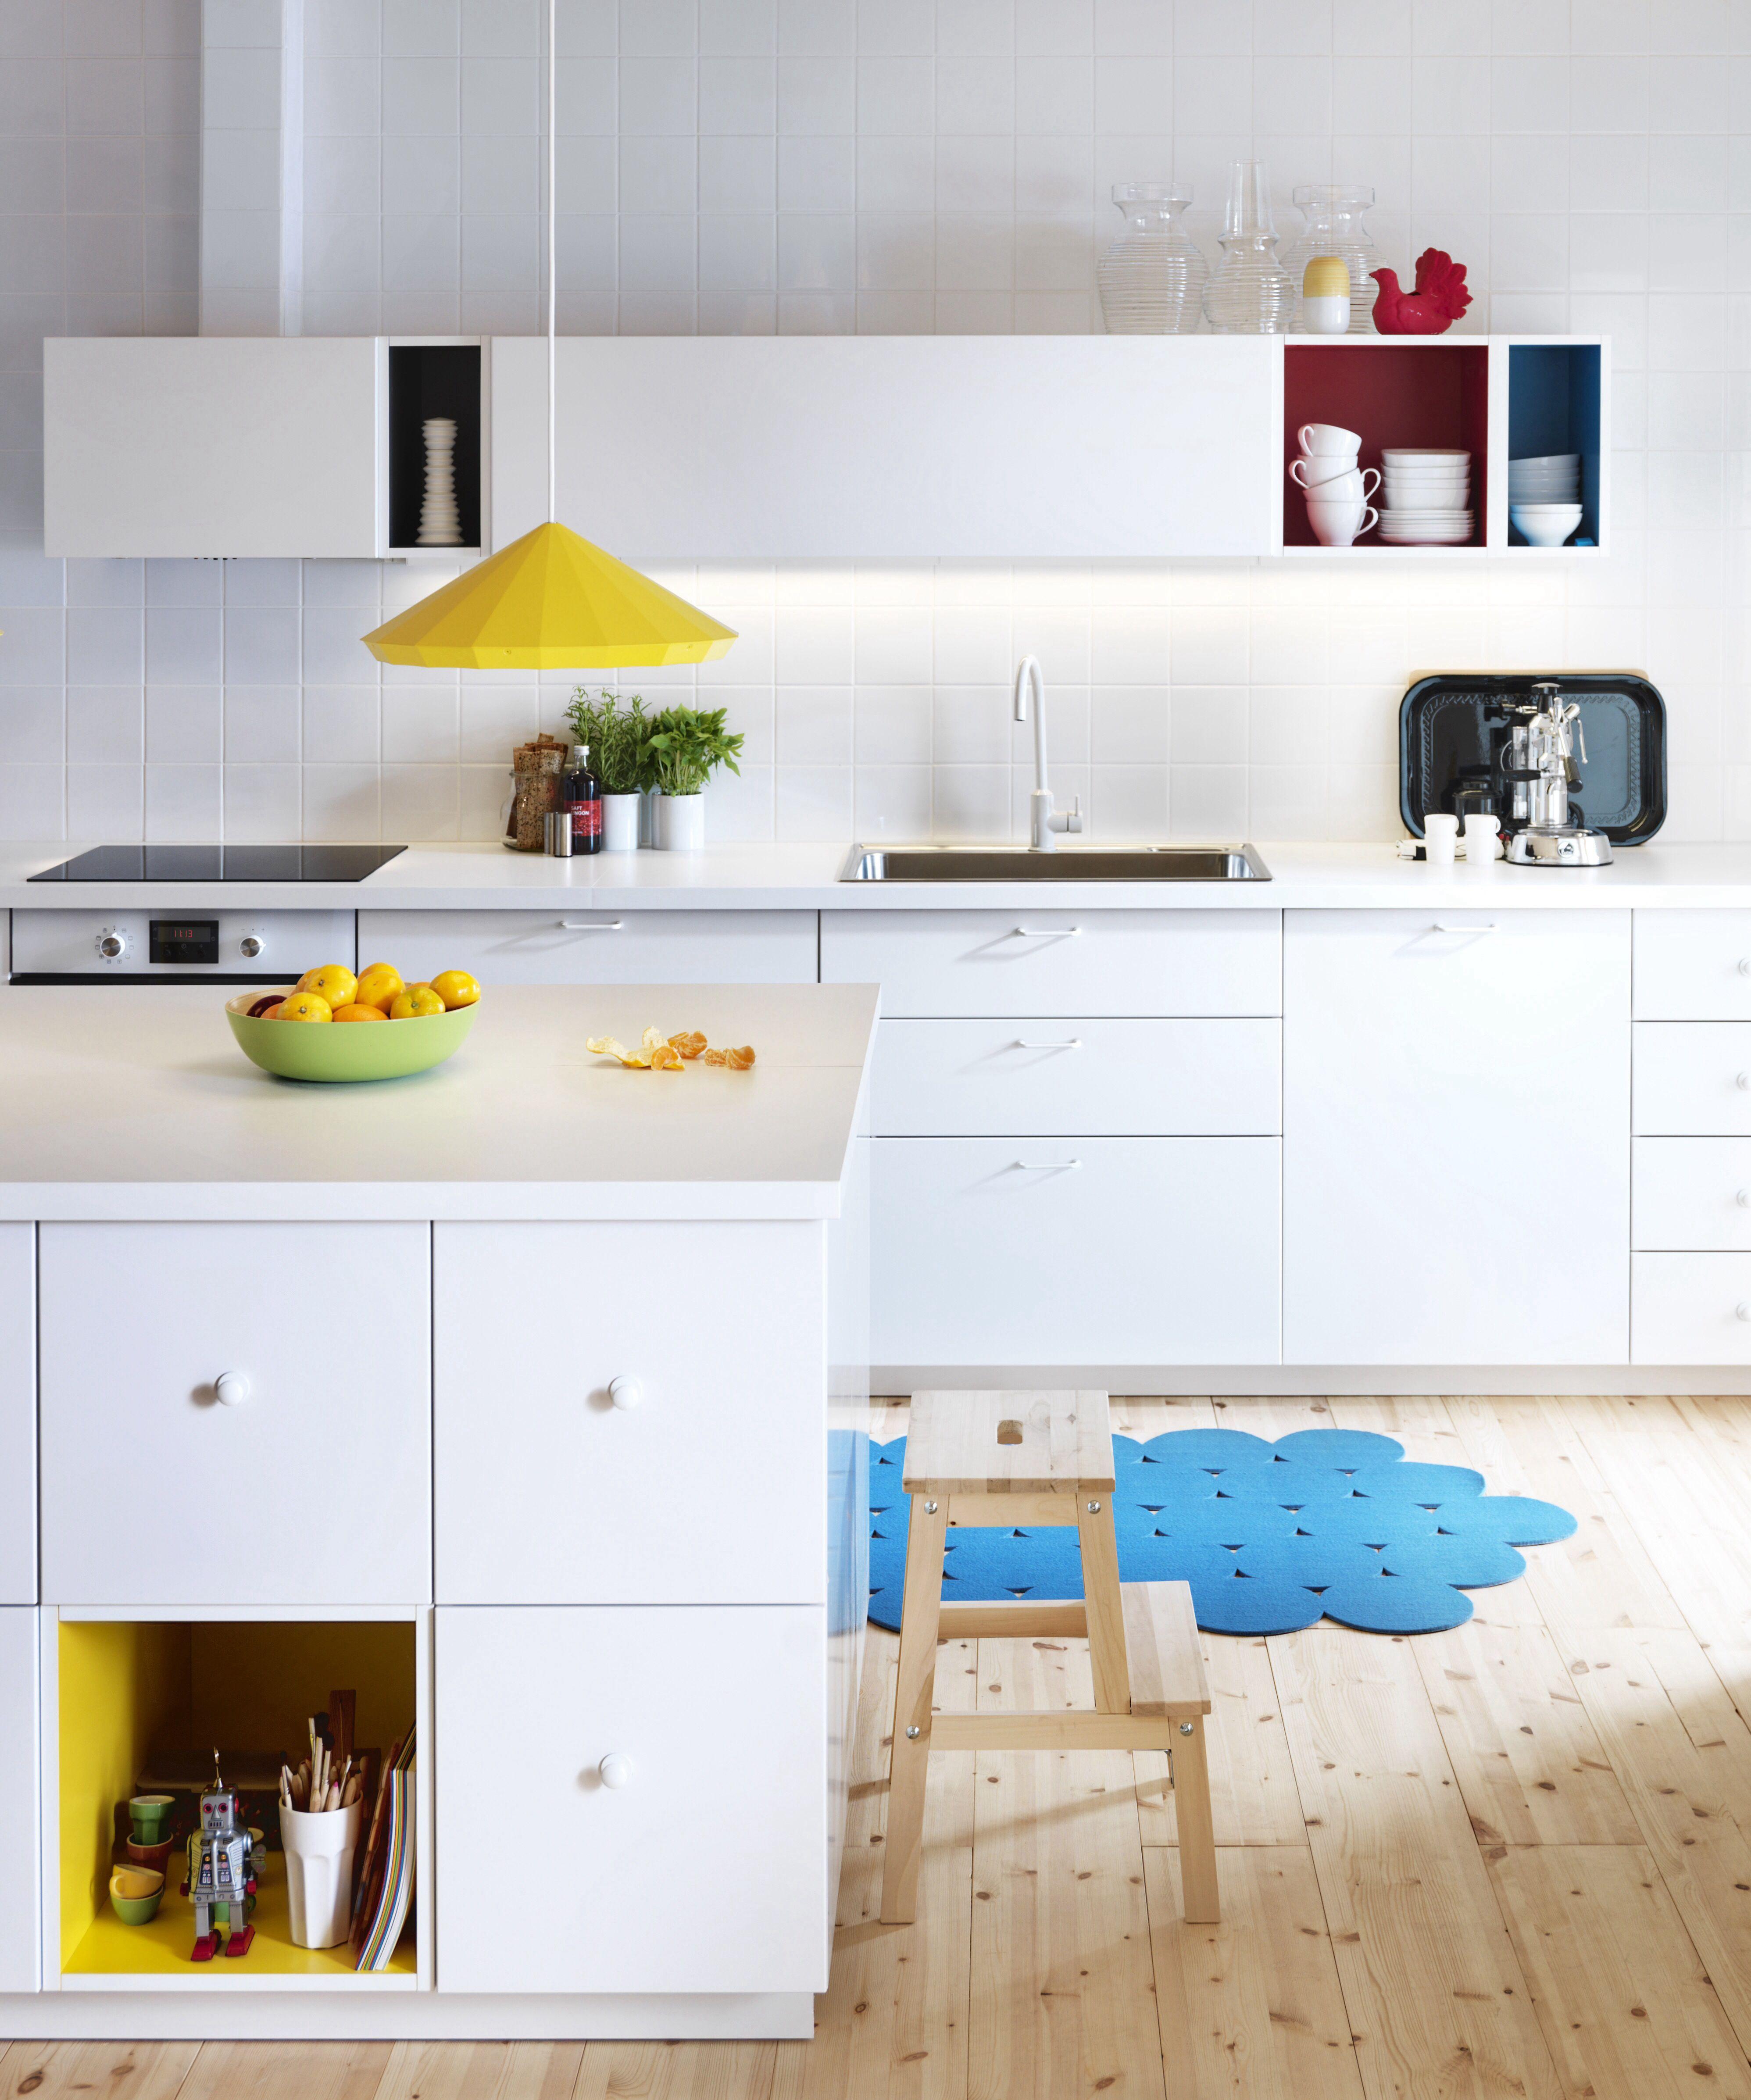 """Metod"" mit farbigen Akzenten - Bild 2 | Ikea küche, Ikea ..."